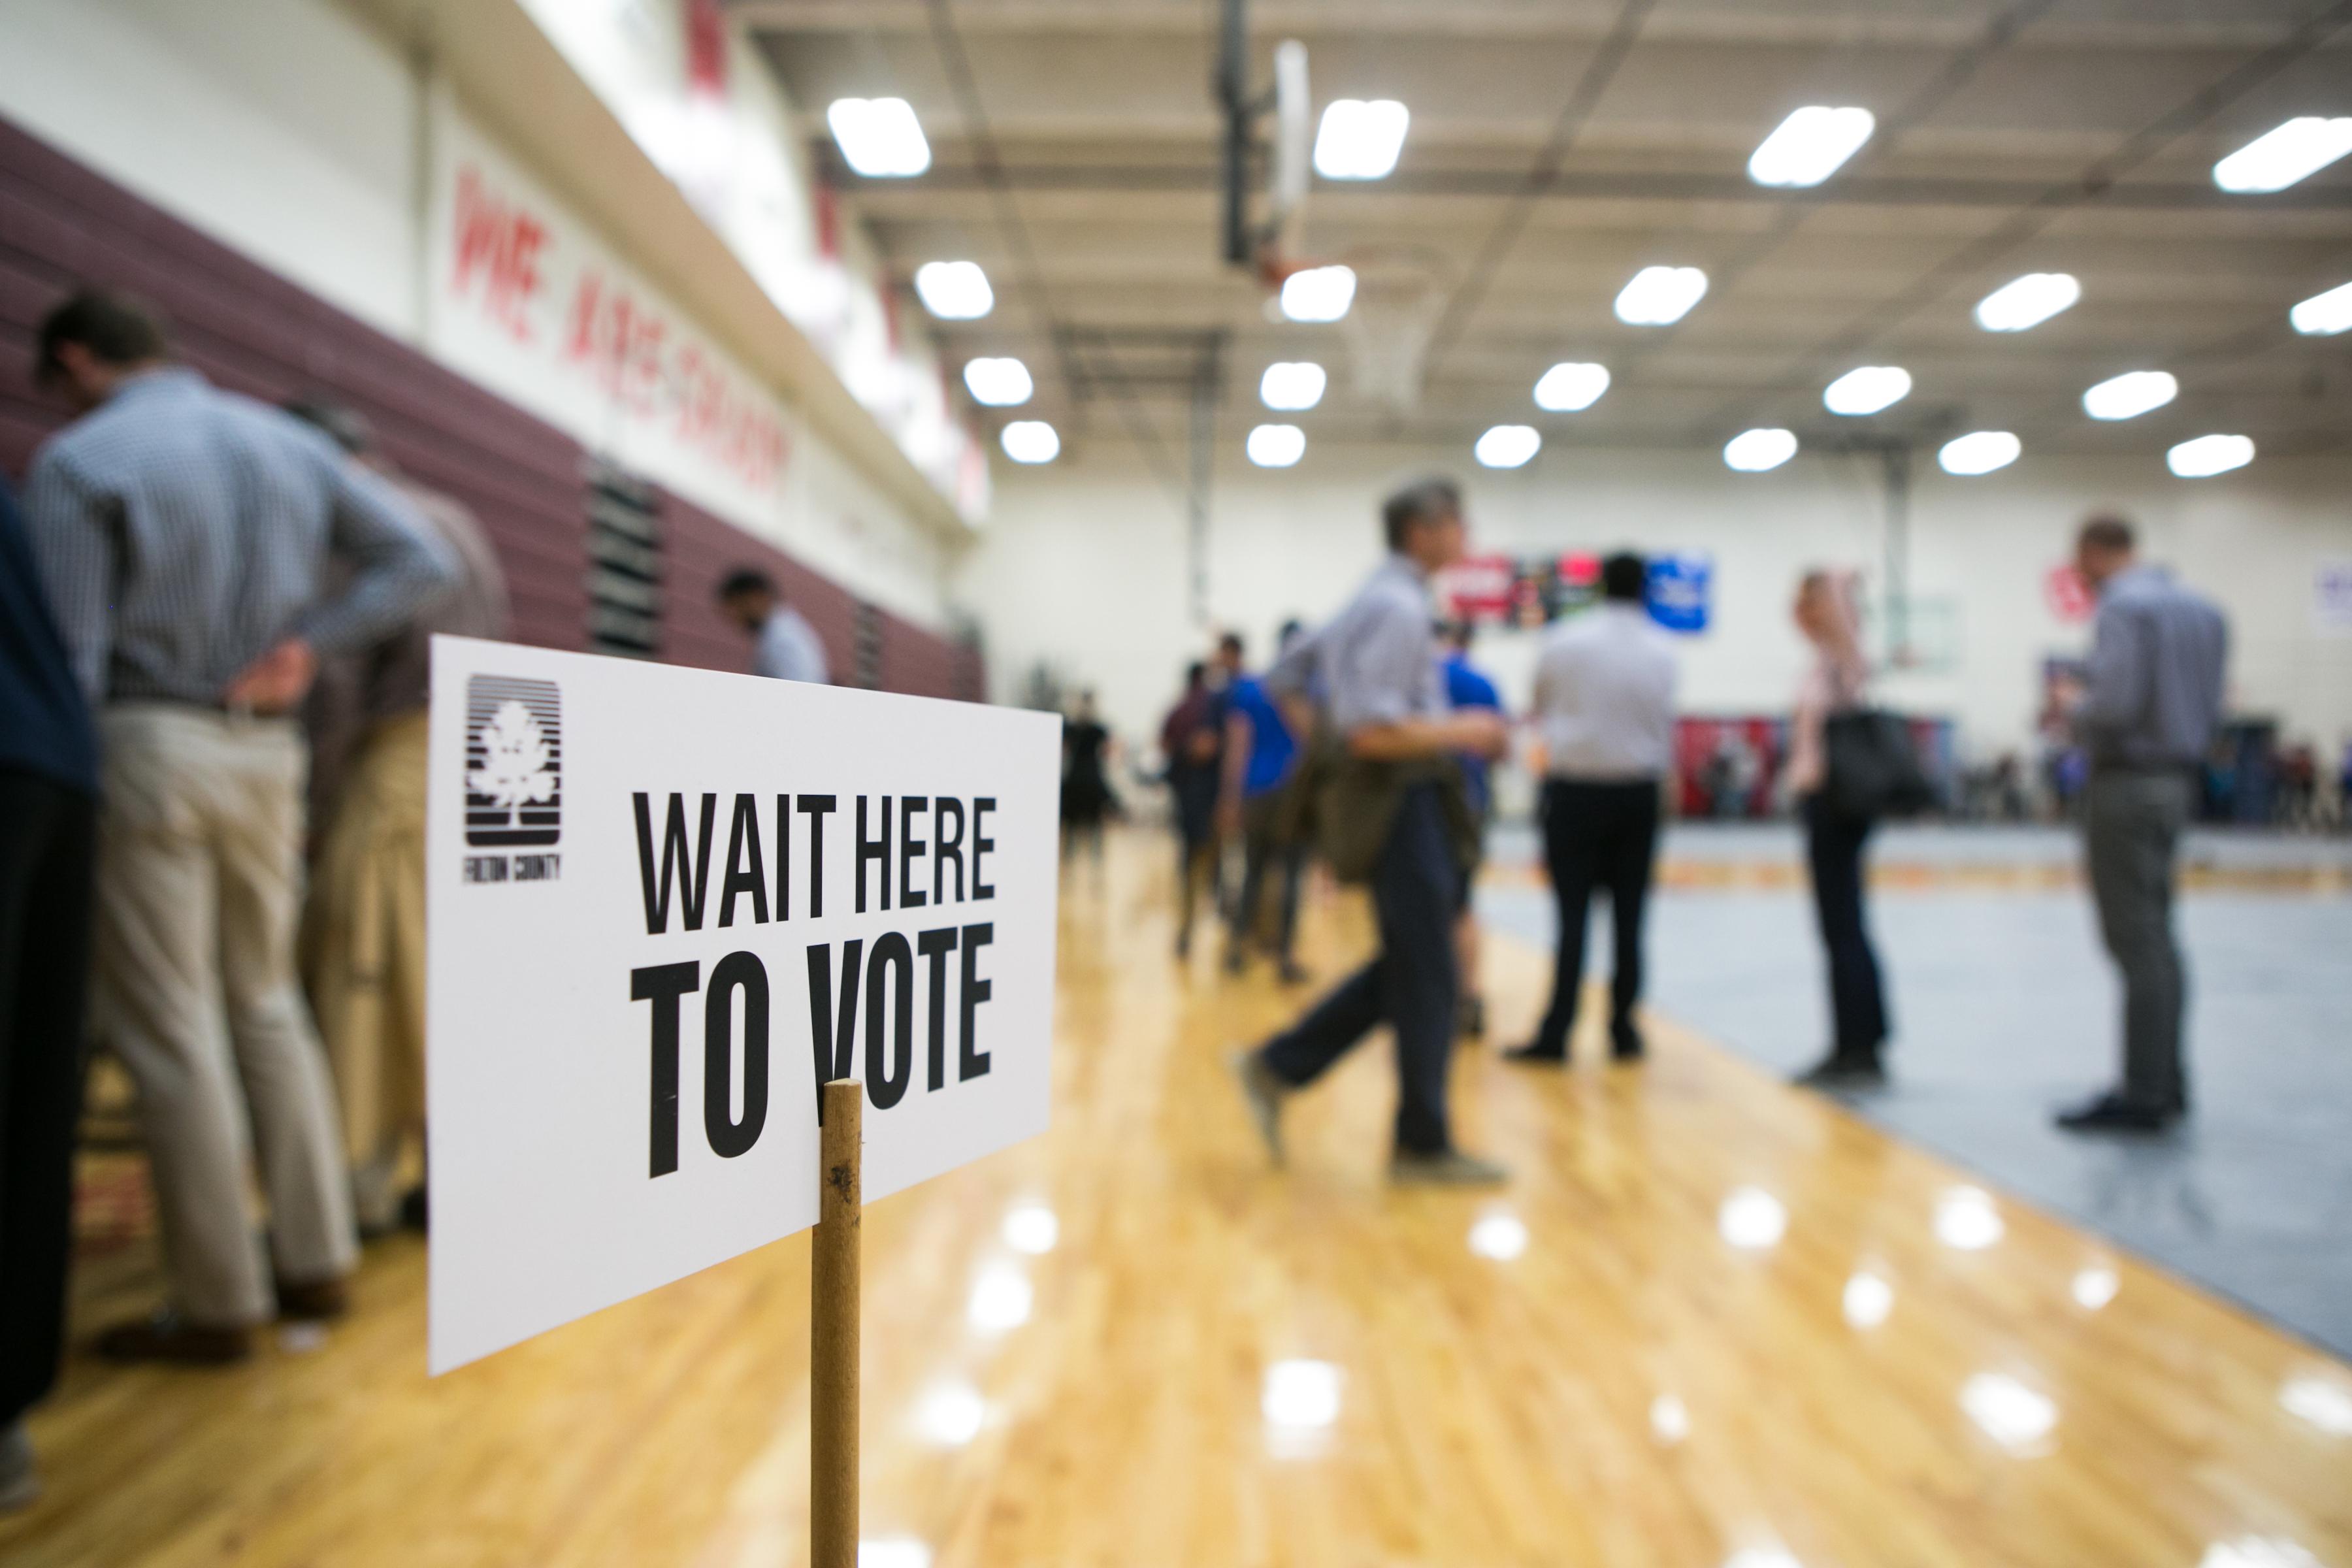 Georgia voters on November 6, 2018